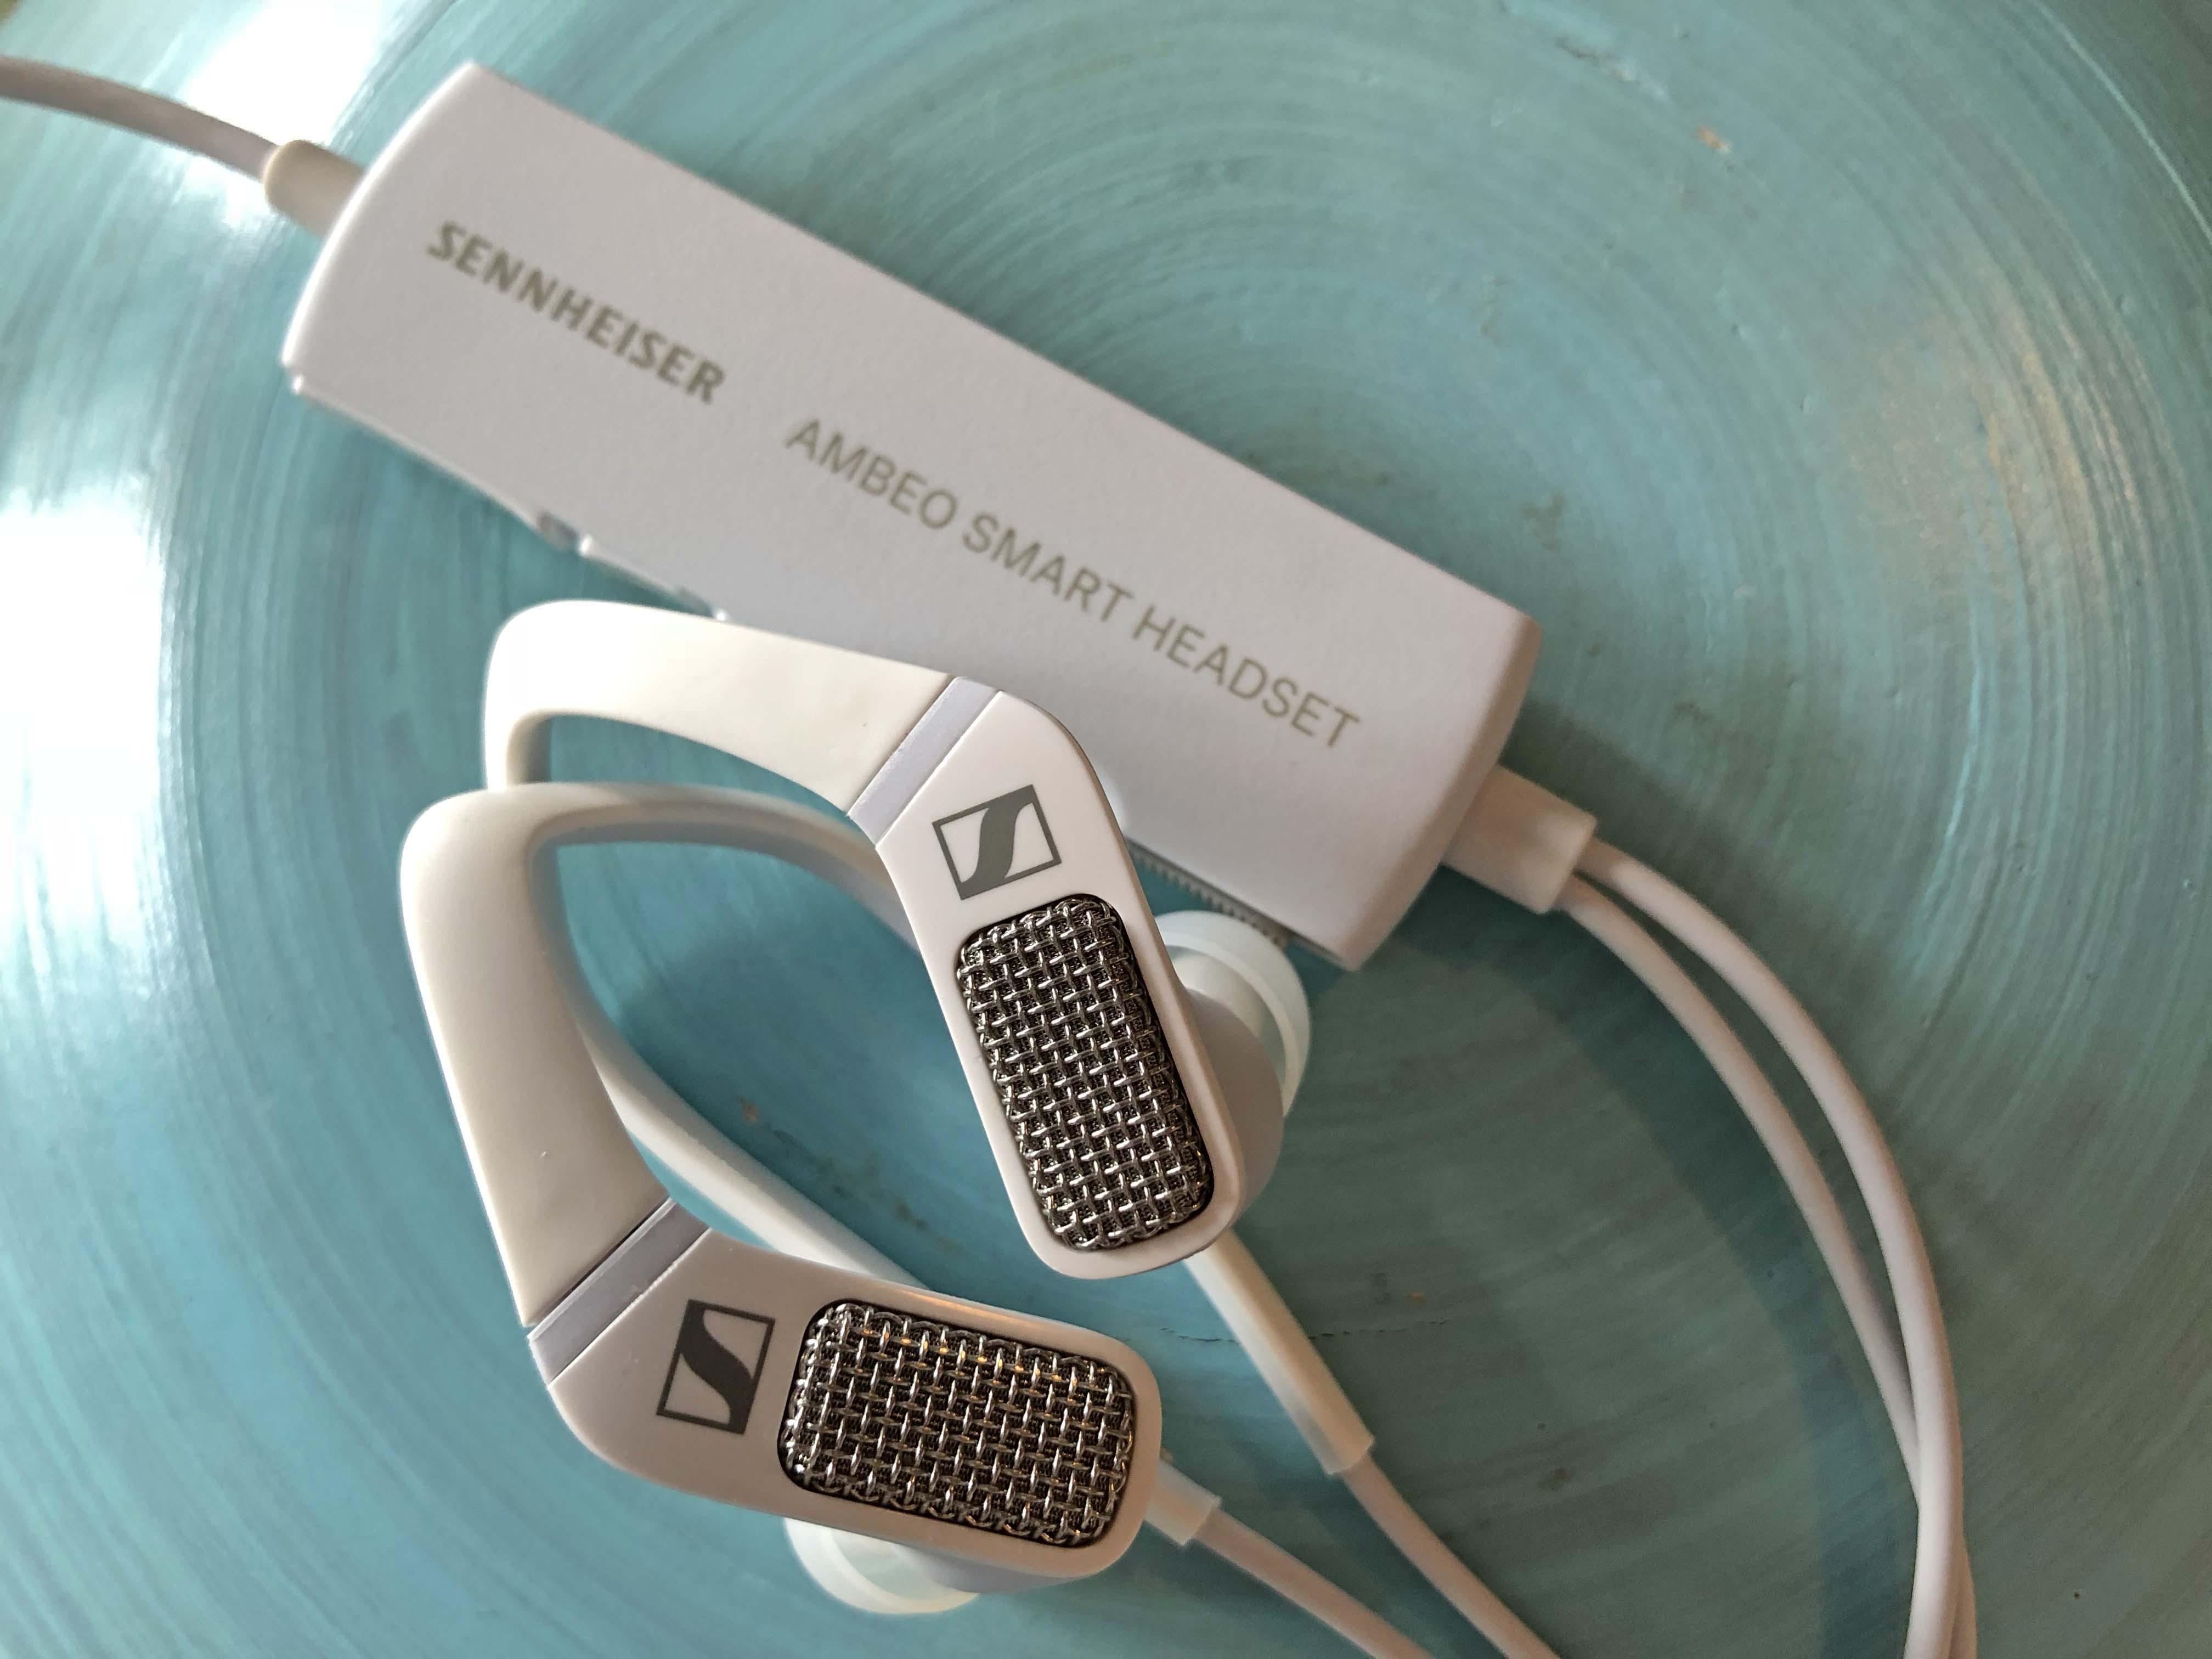 sennheiser ambeo smart headset im test intensiv und. Black Bedroom Furniture Sets. Home Design Ideas